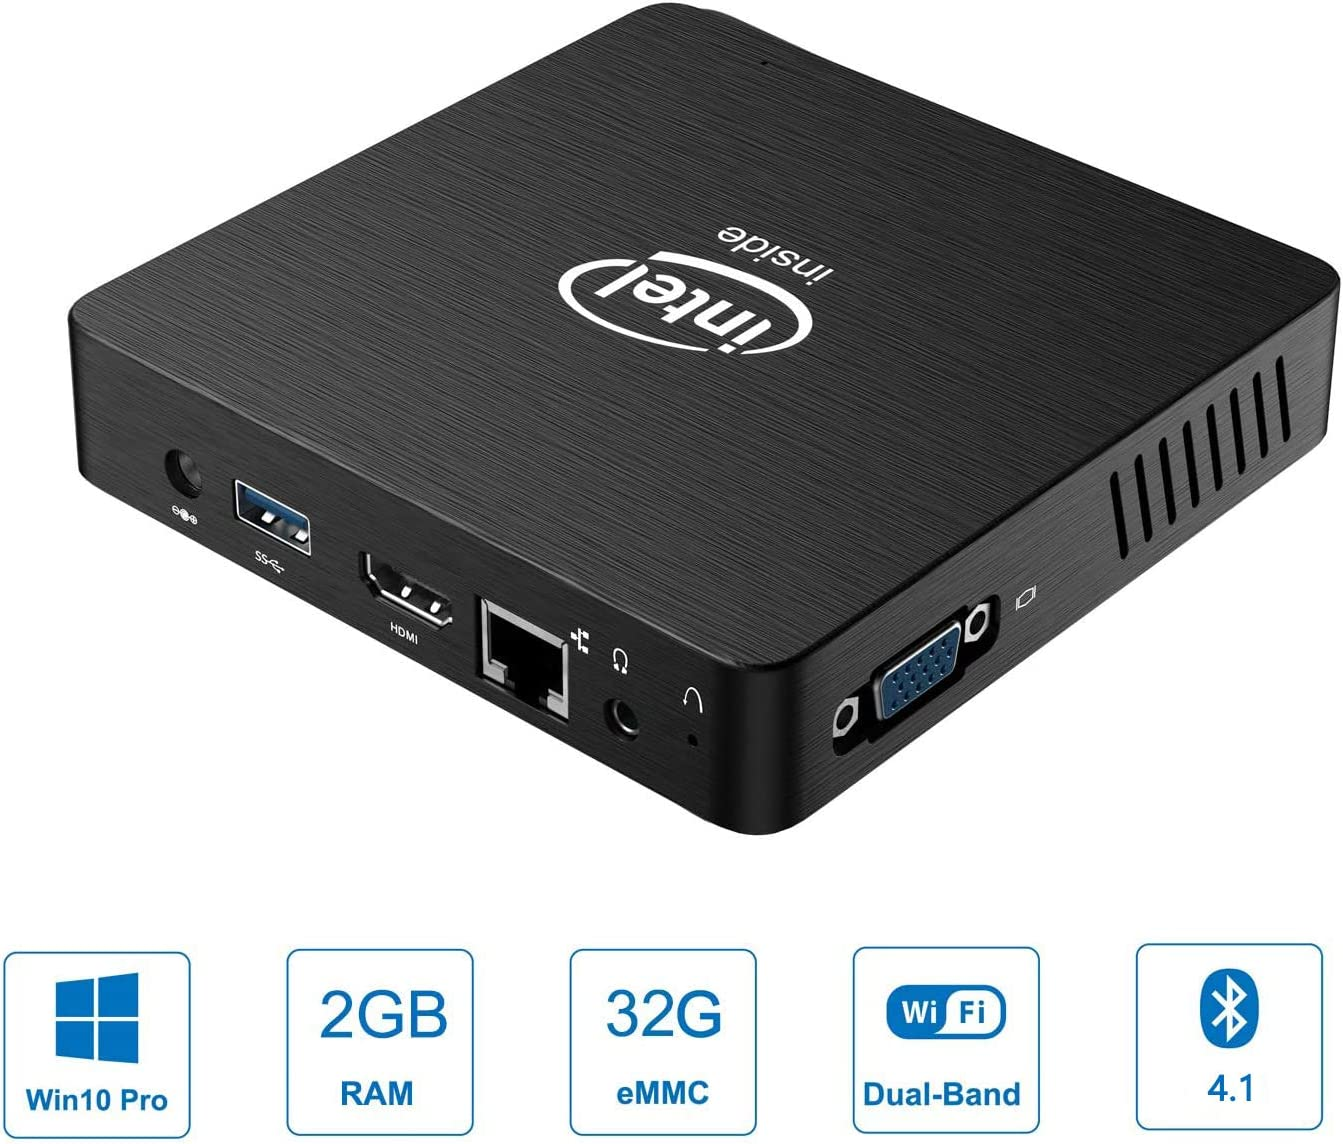 Z83-W Mini PC Intel Z8350 Fanless Desktop Computer 2GB RAM/ 32GB, HDMI&VGA Port for Dual Display, 1000M LAN, Auto Power On, Windows 10 Pro Mini Computer